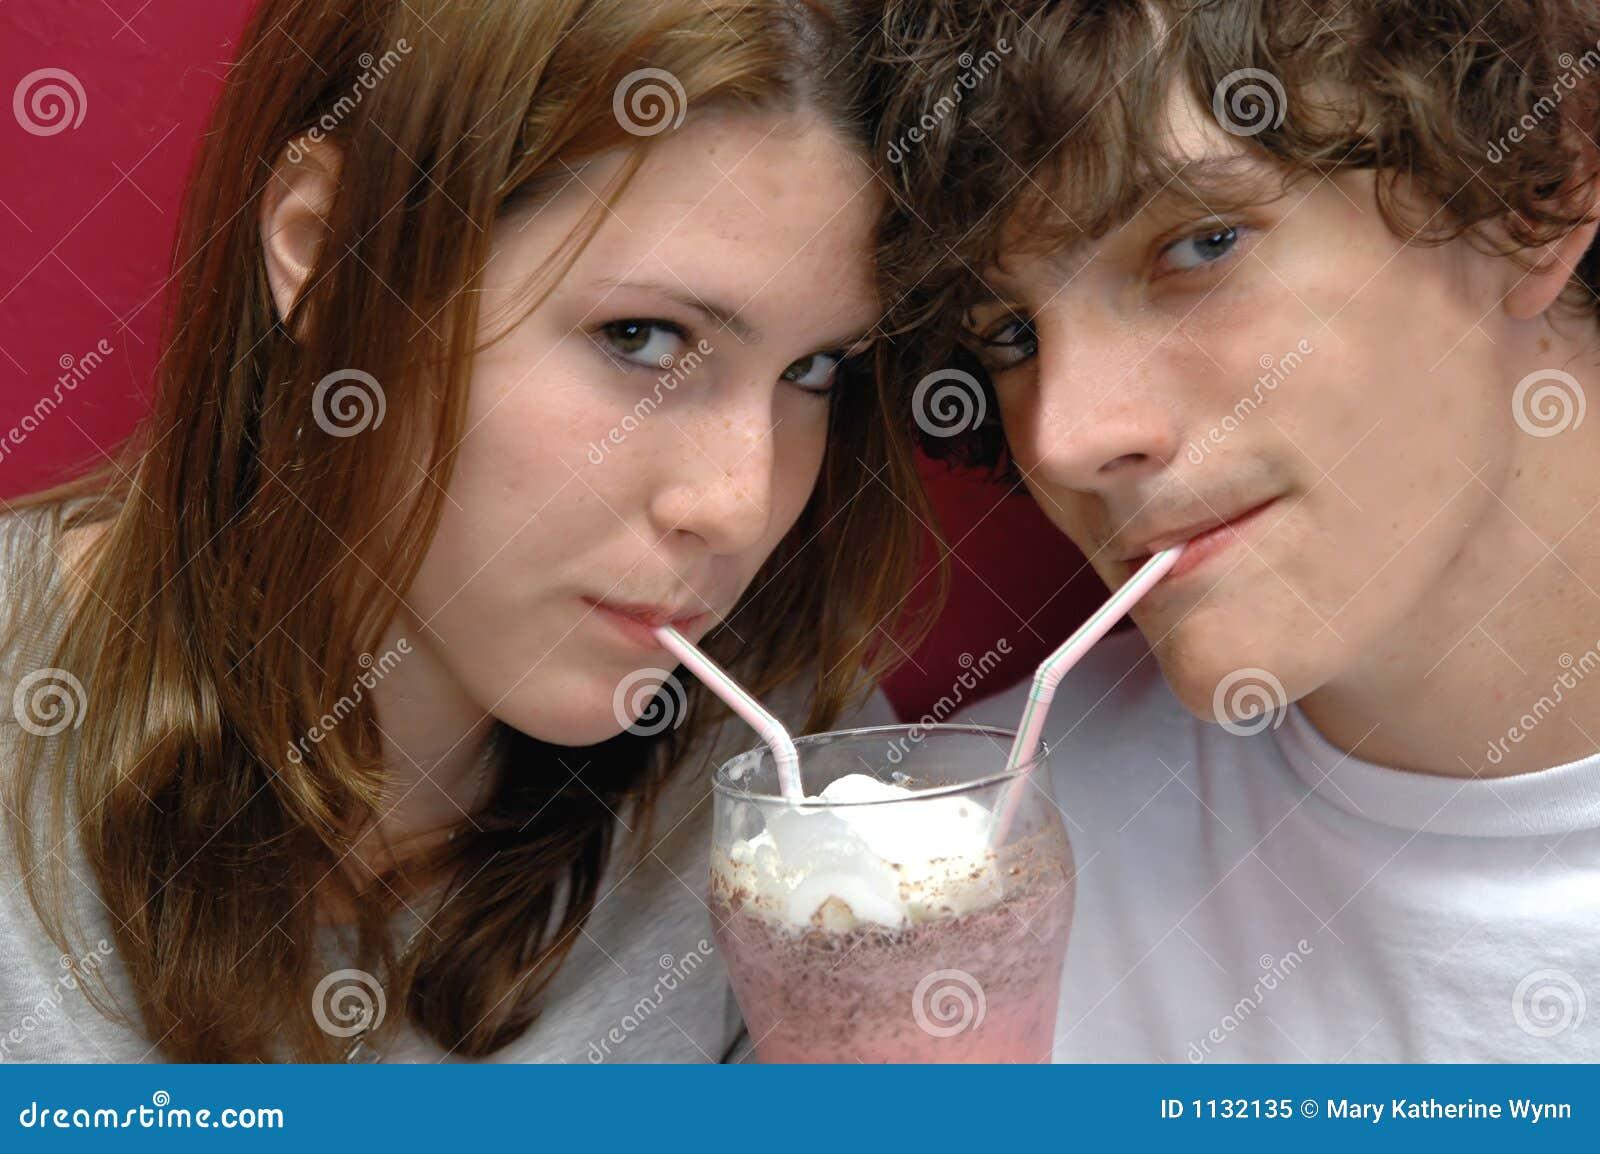 Sharing a sip